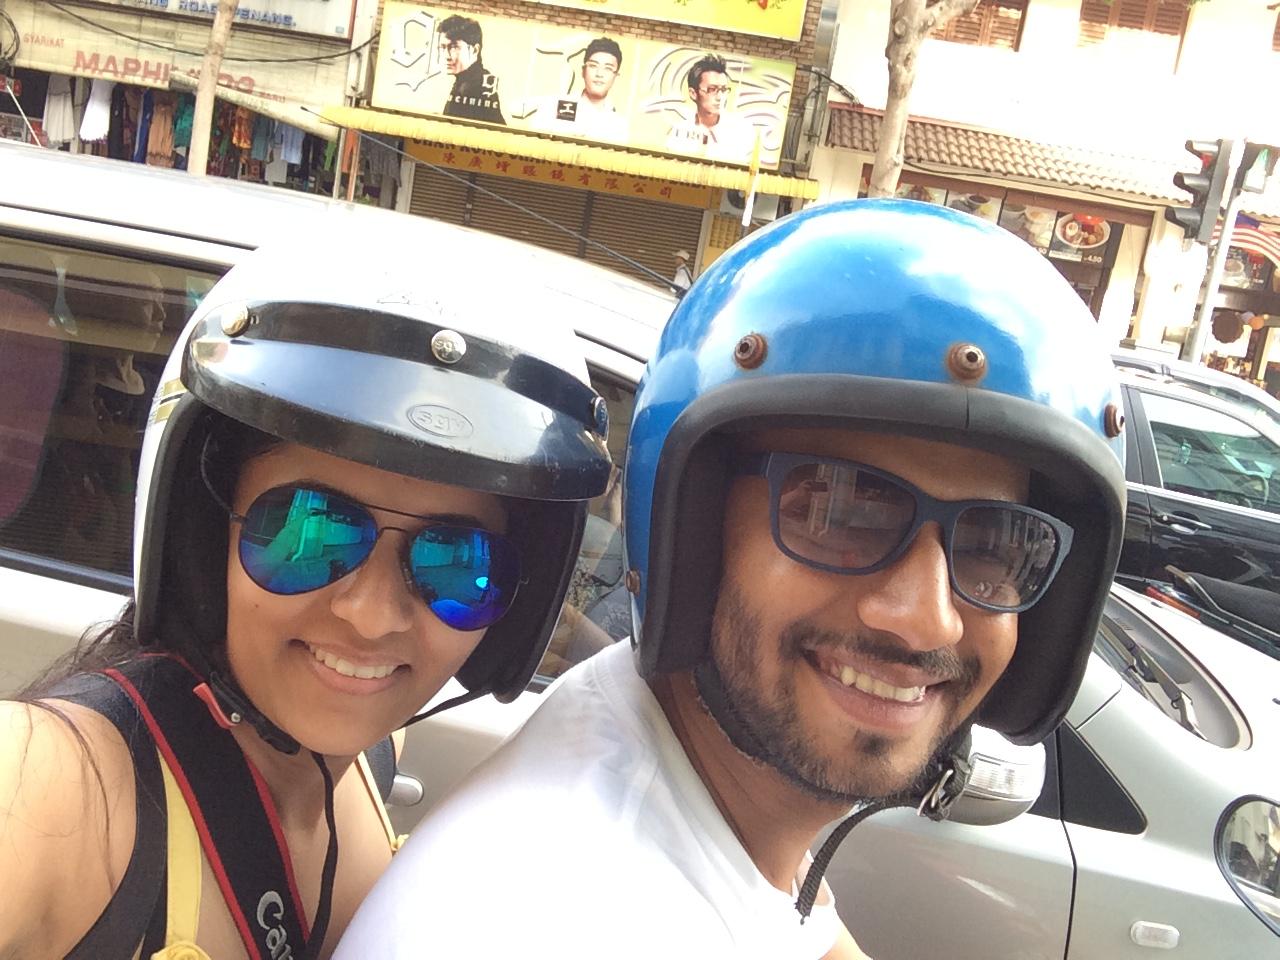 Ride on 2 wheeler